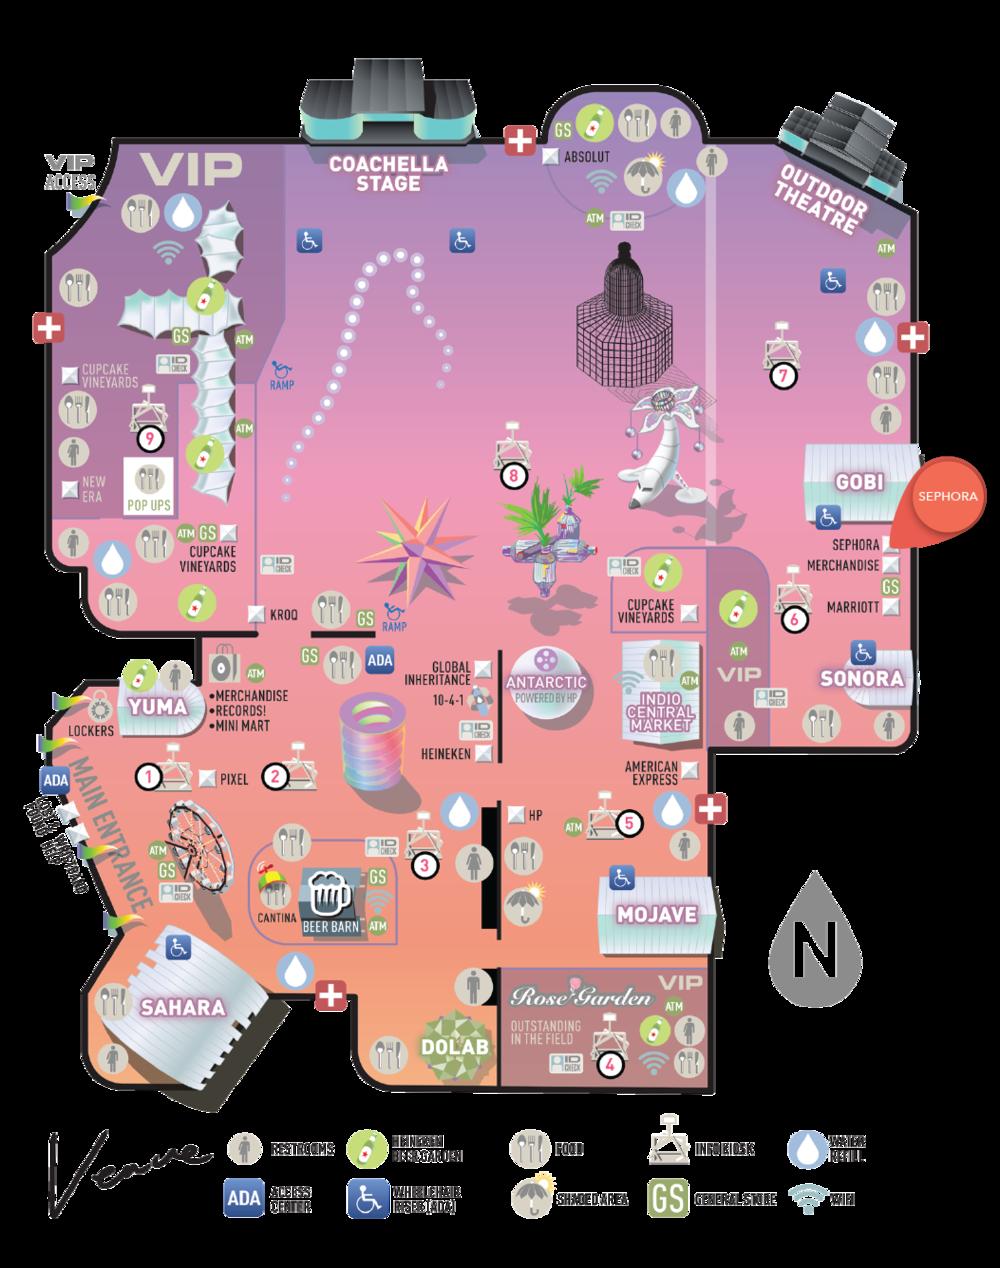 Sephora_venue map.png